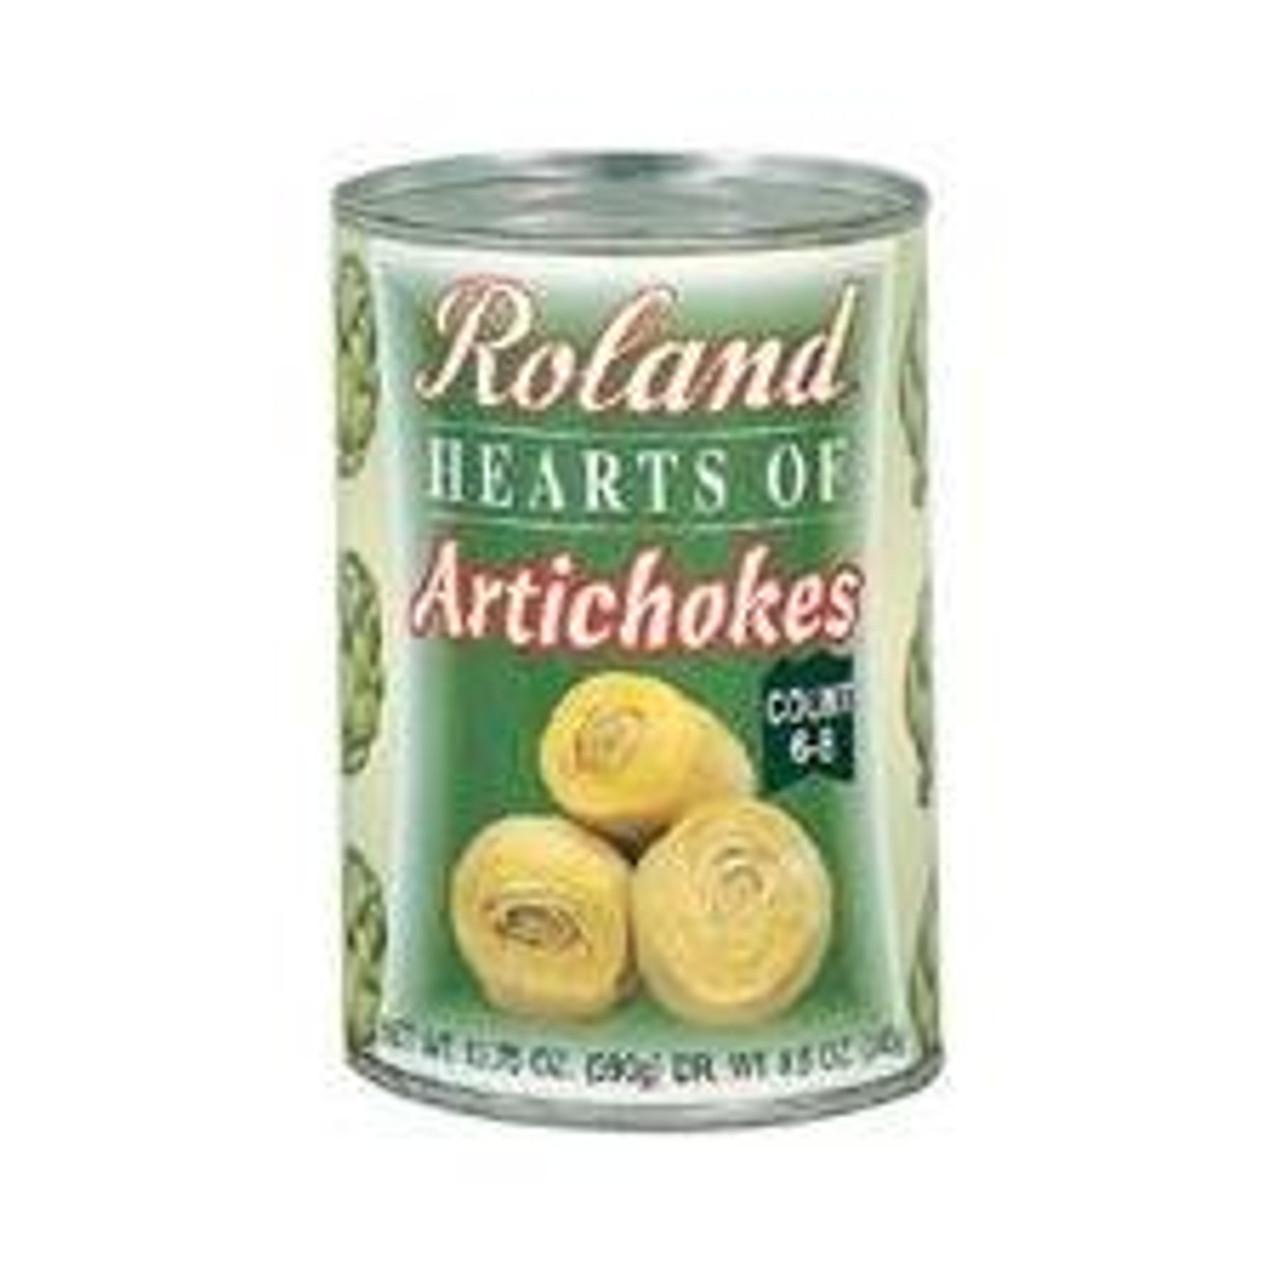 Hearts of Artichokes